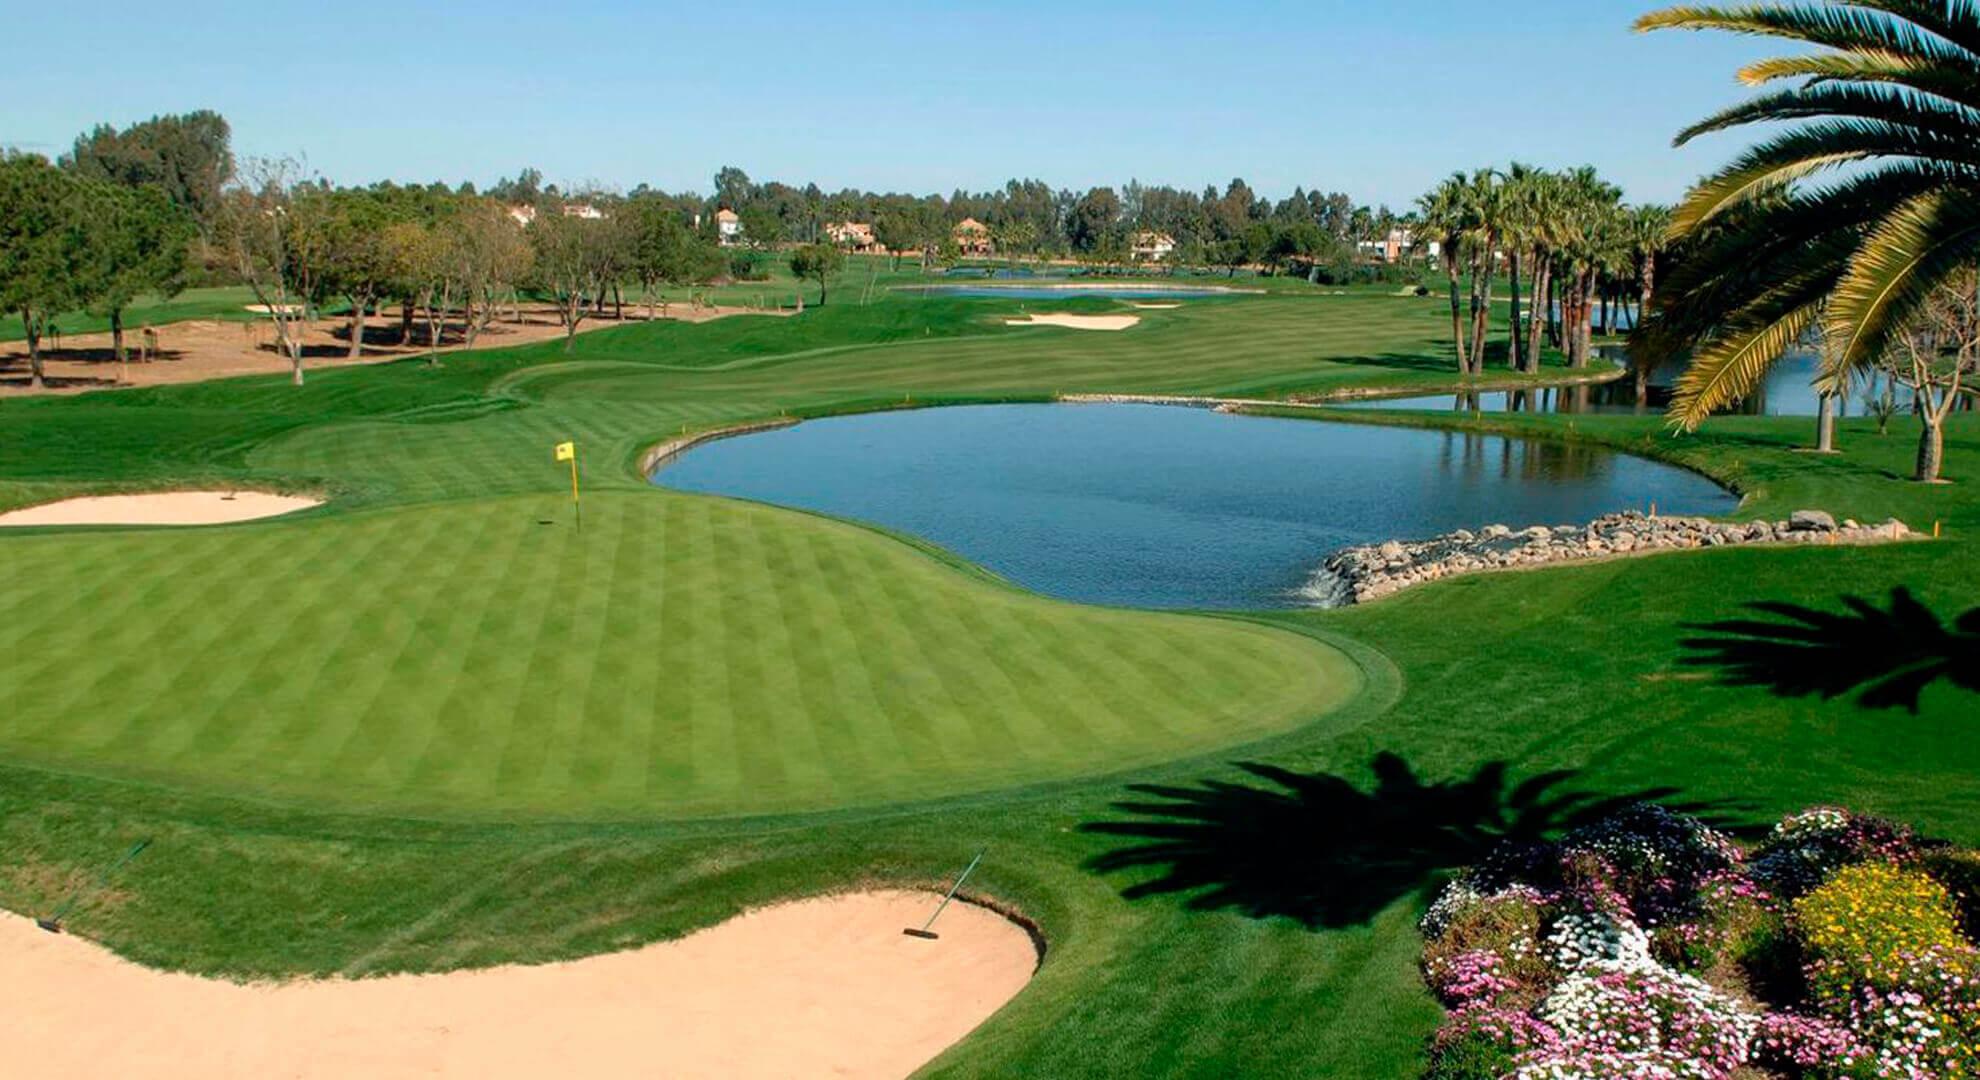 Real Club Sevilla Golf Course, Spain